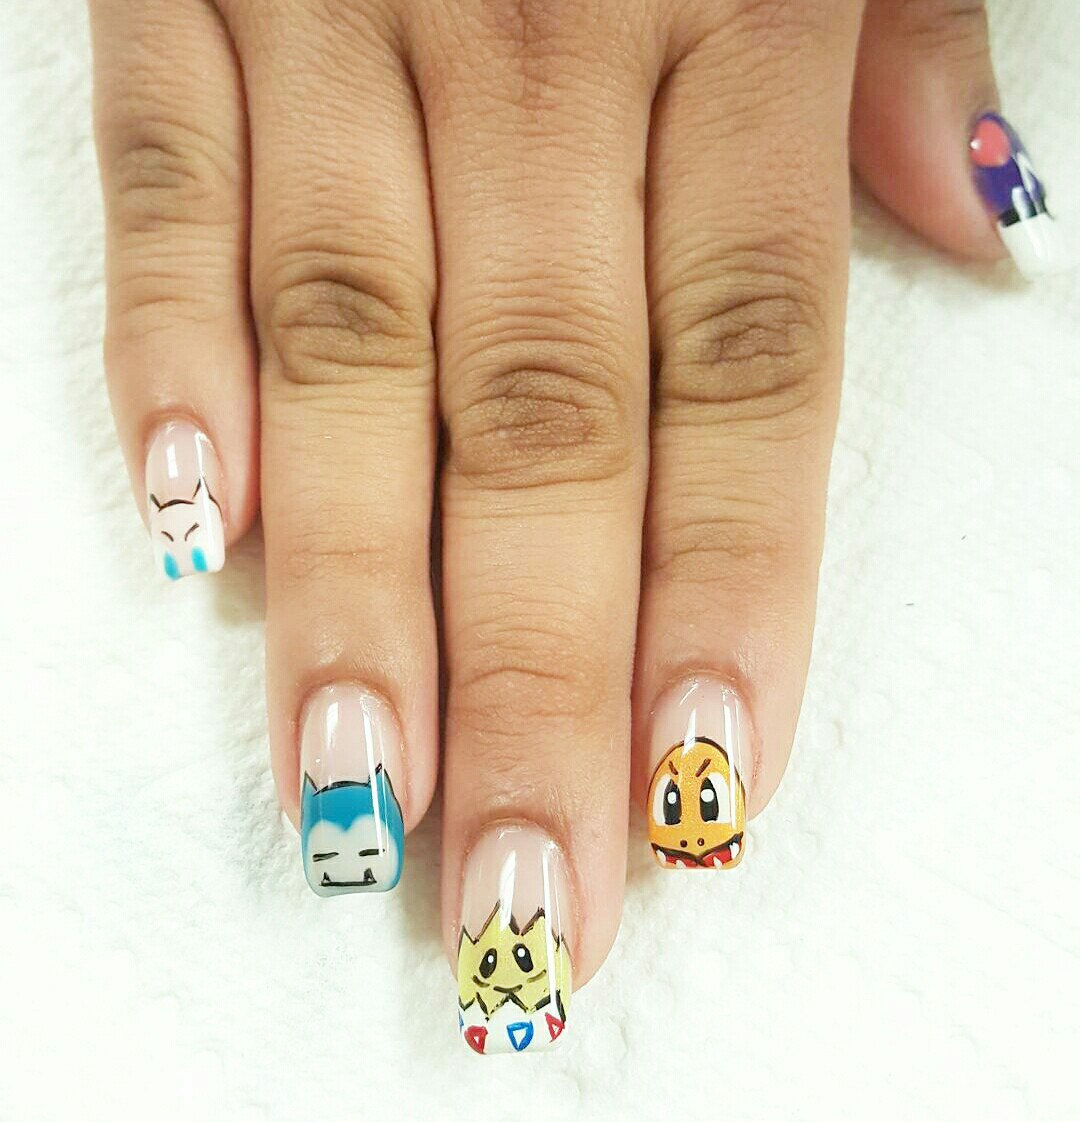 Pokemon Nails Art: Best Design Tutorial | LadyLife